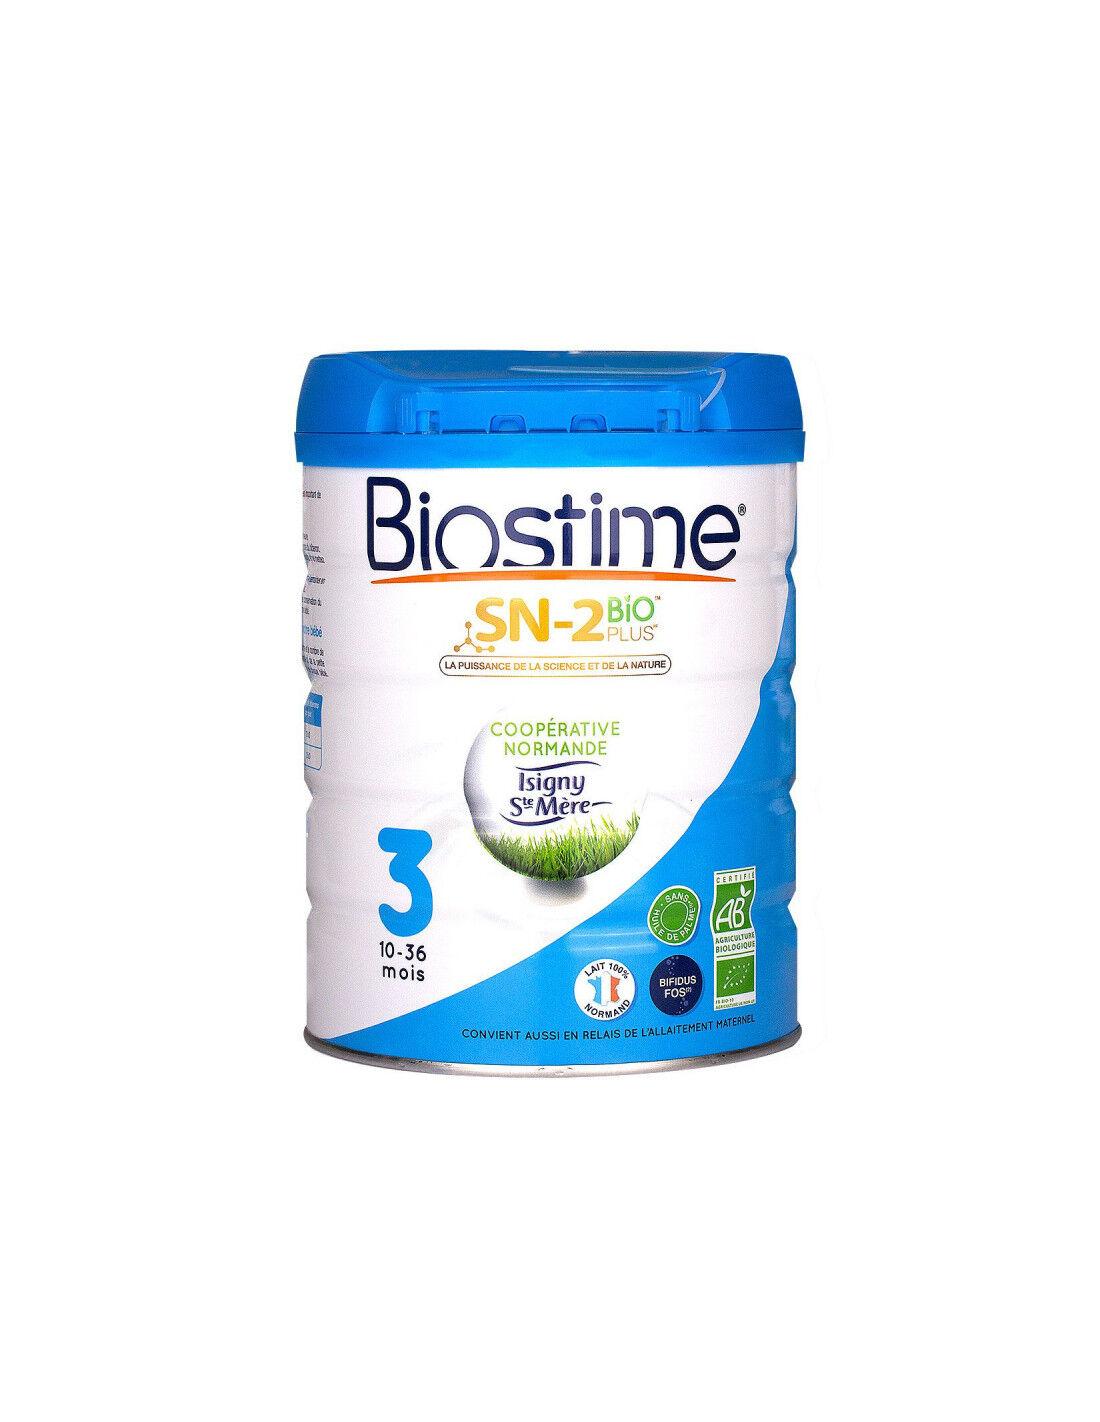 BIOSTIME BIO CROISSANCE 10-36 mois SN-2 800g